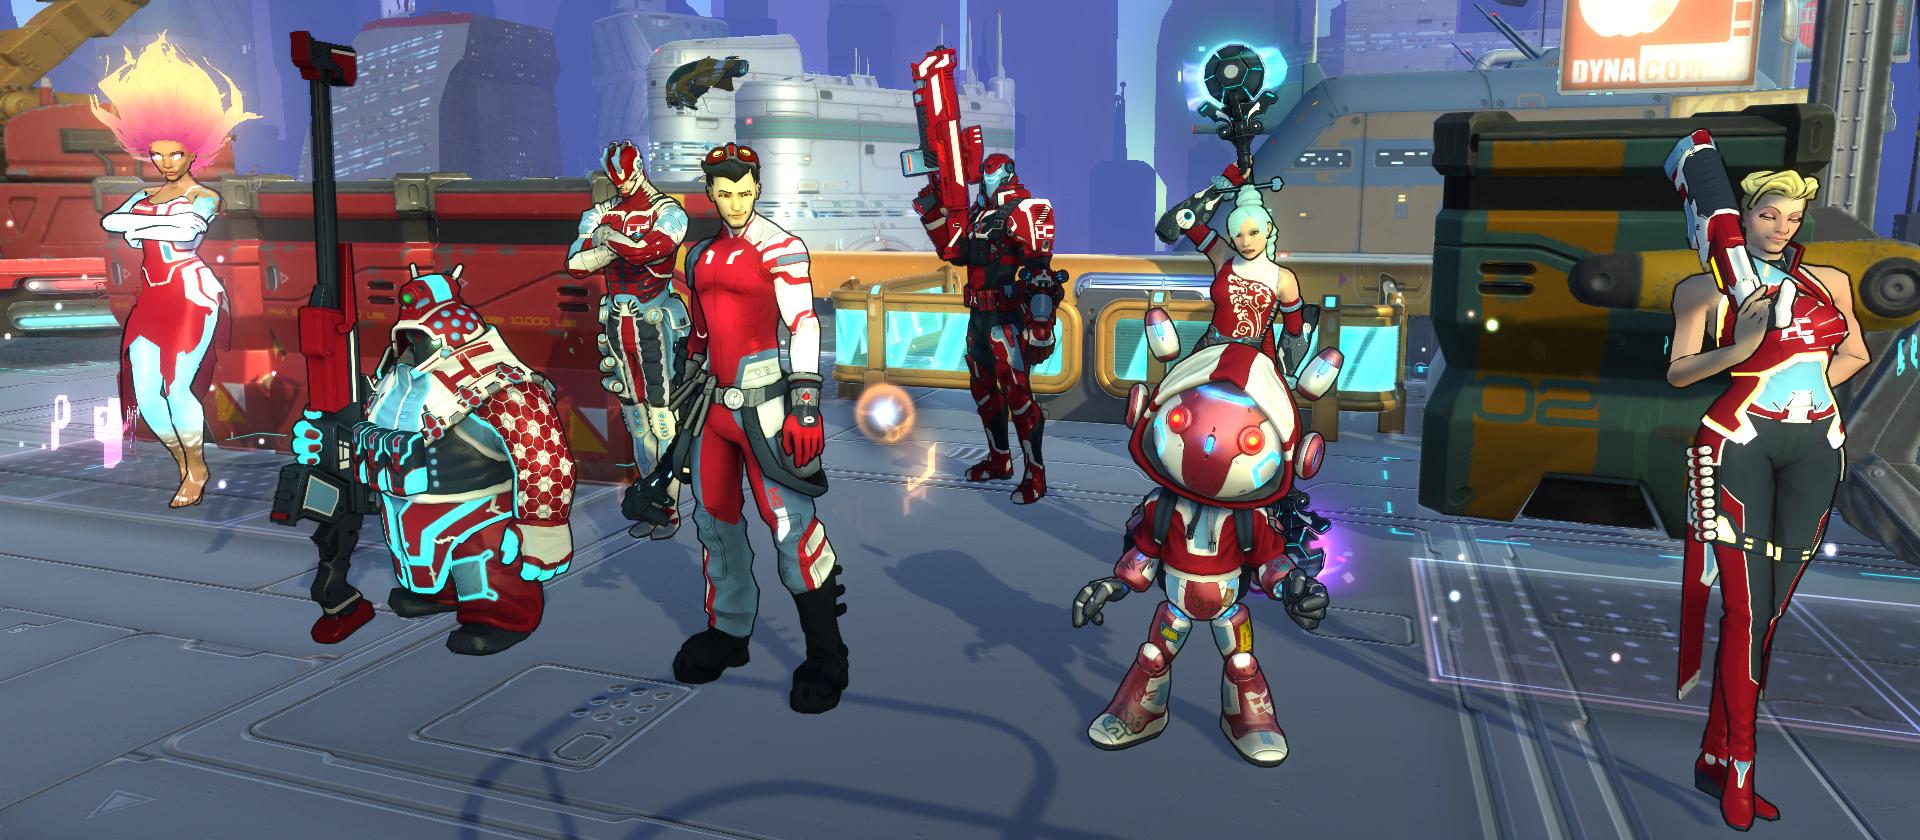 how to play atlas reactor